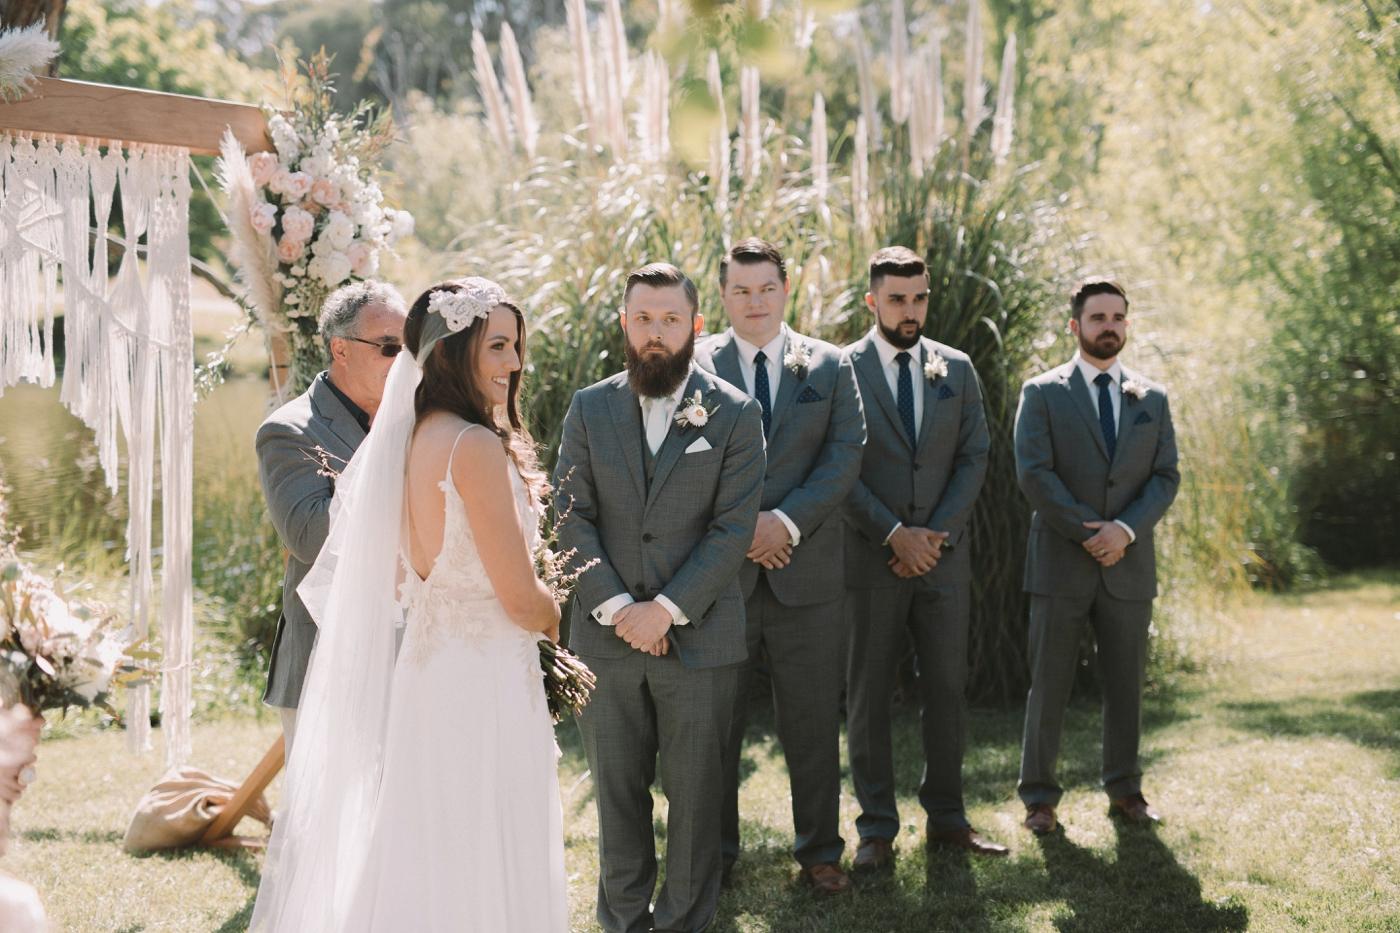 Maddy & Wes - K1 by Geoff Hardy Wedding - Adelaide Wedding Photographer - Natural wedding photography in Adelaide - Katherine Schultz_0025.jpg